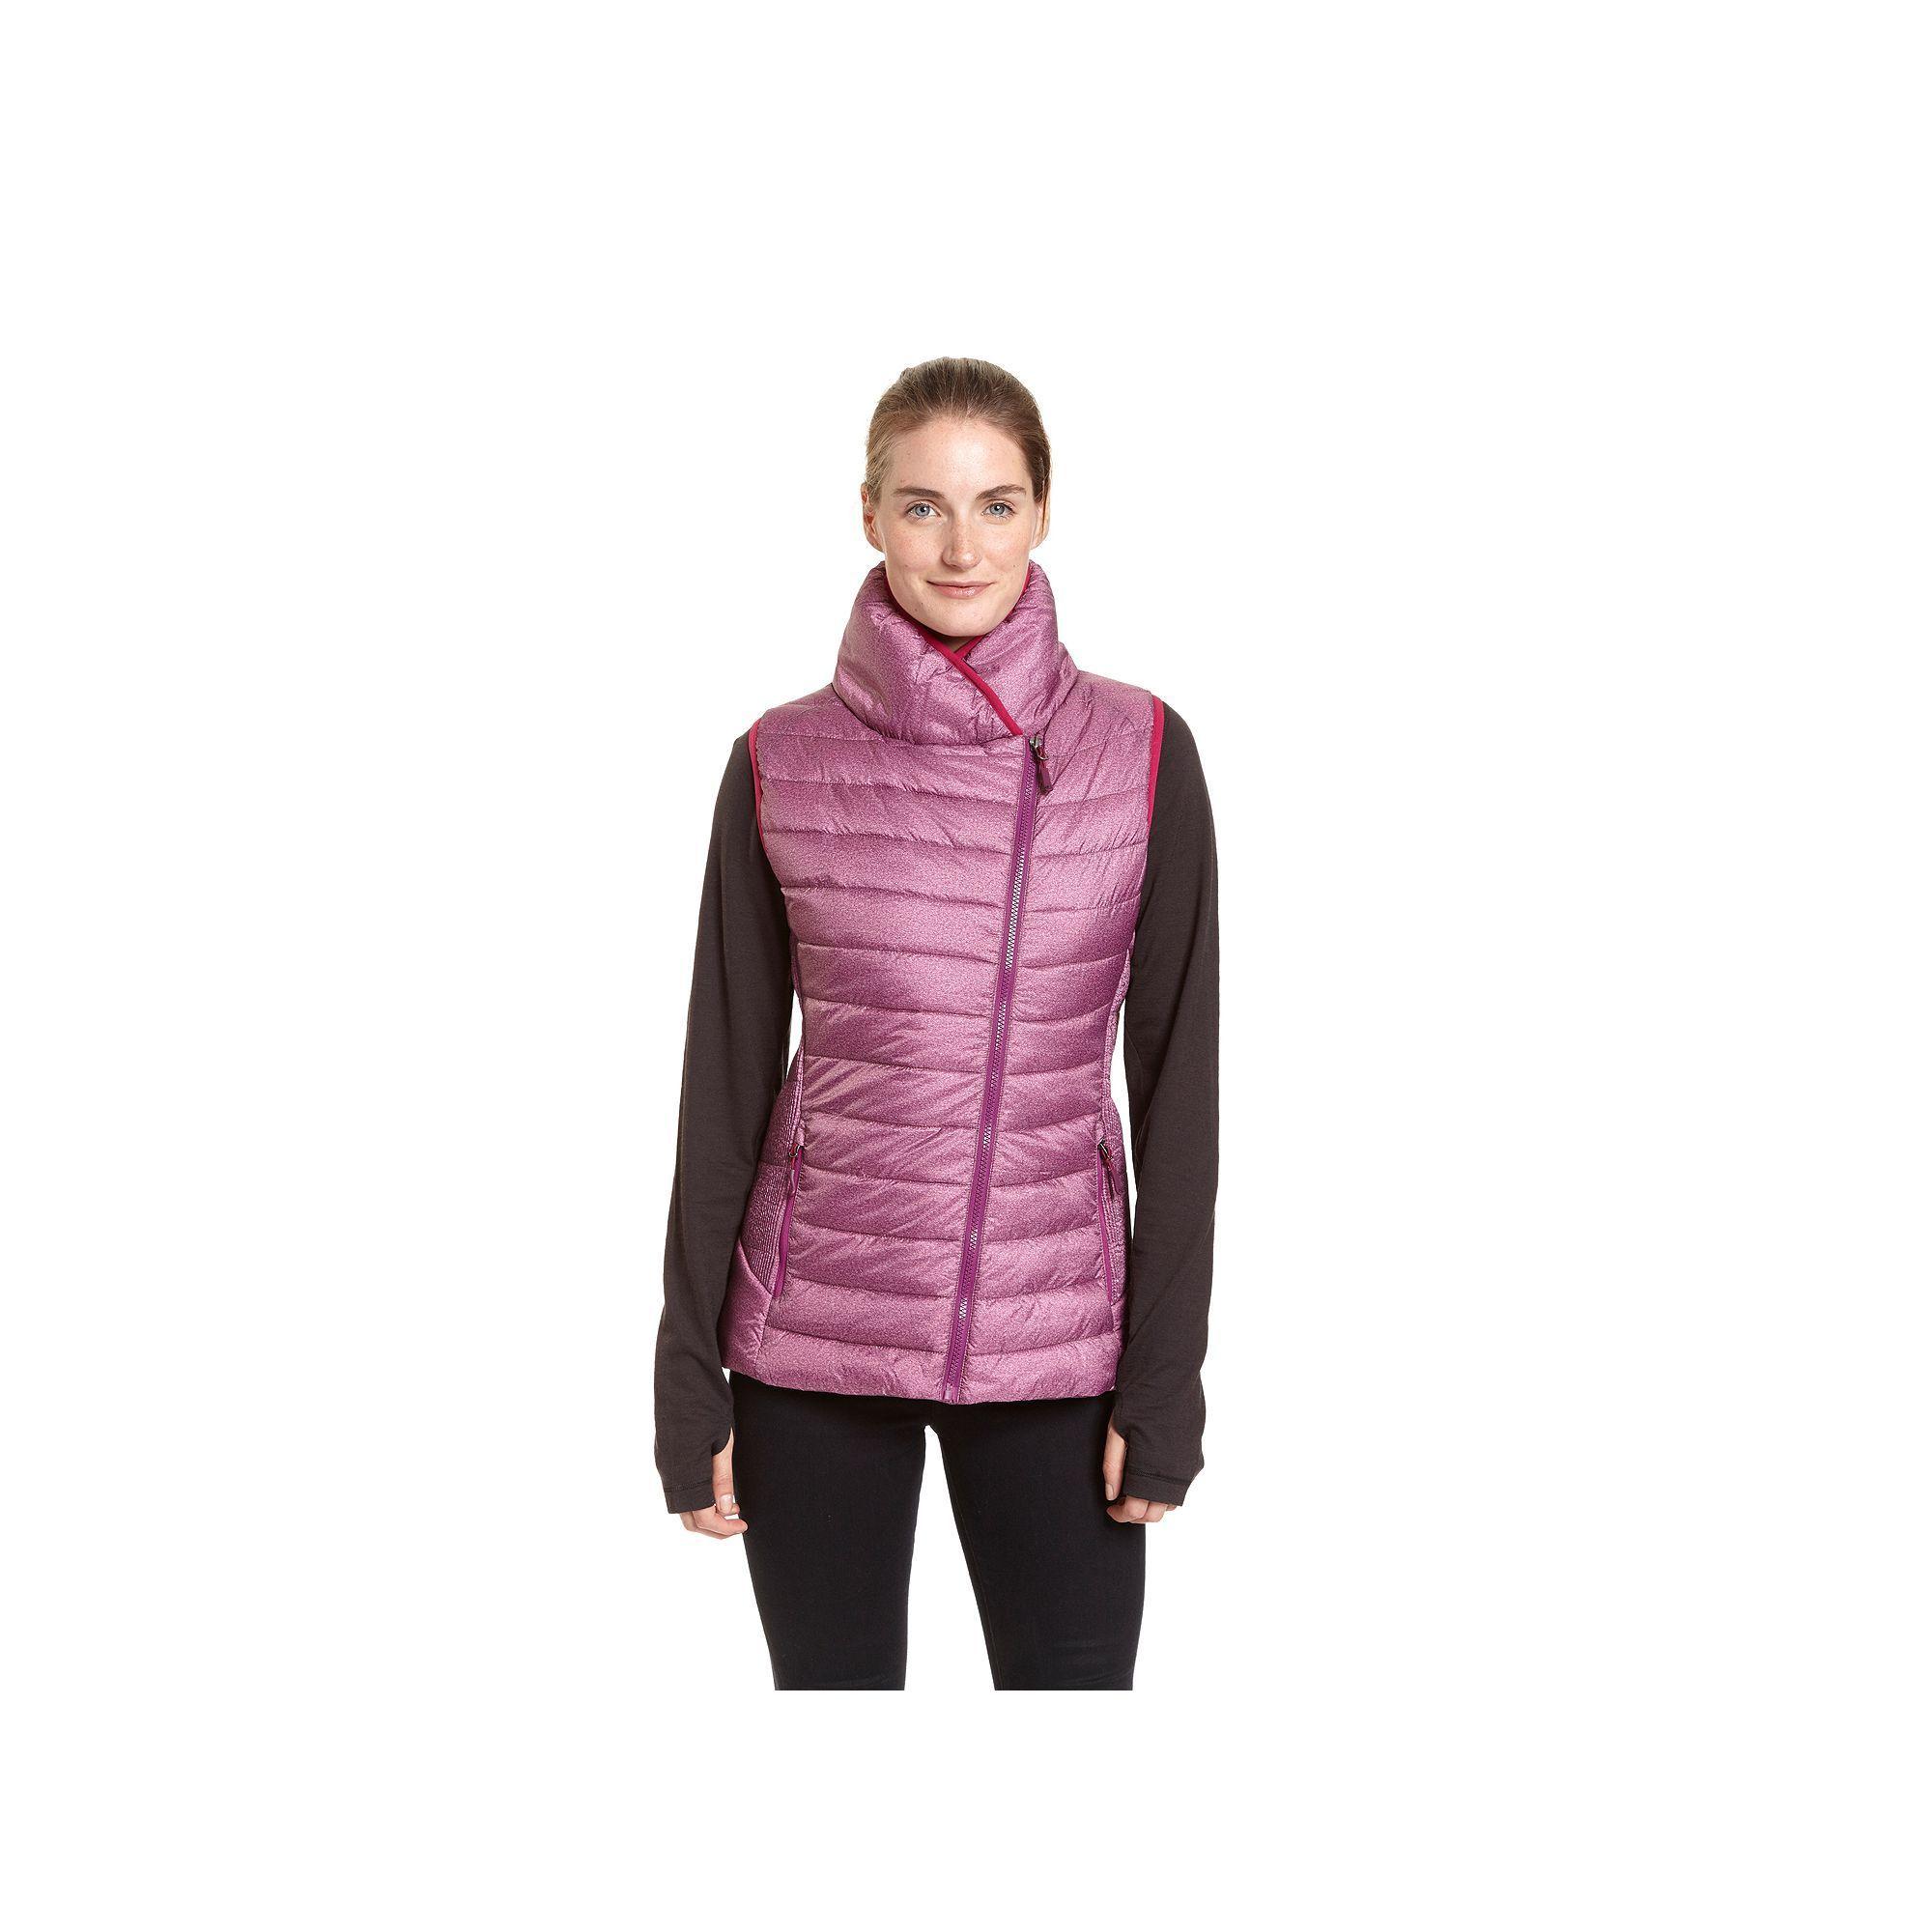 cce872b052163 Women s Champion Asymmetrical Puffer Vest. Plus Size ...